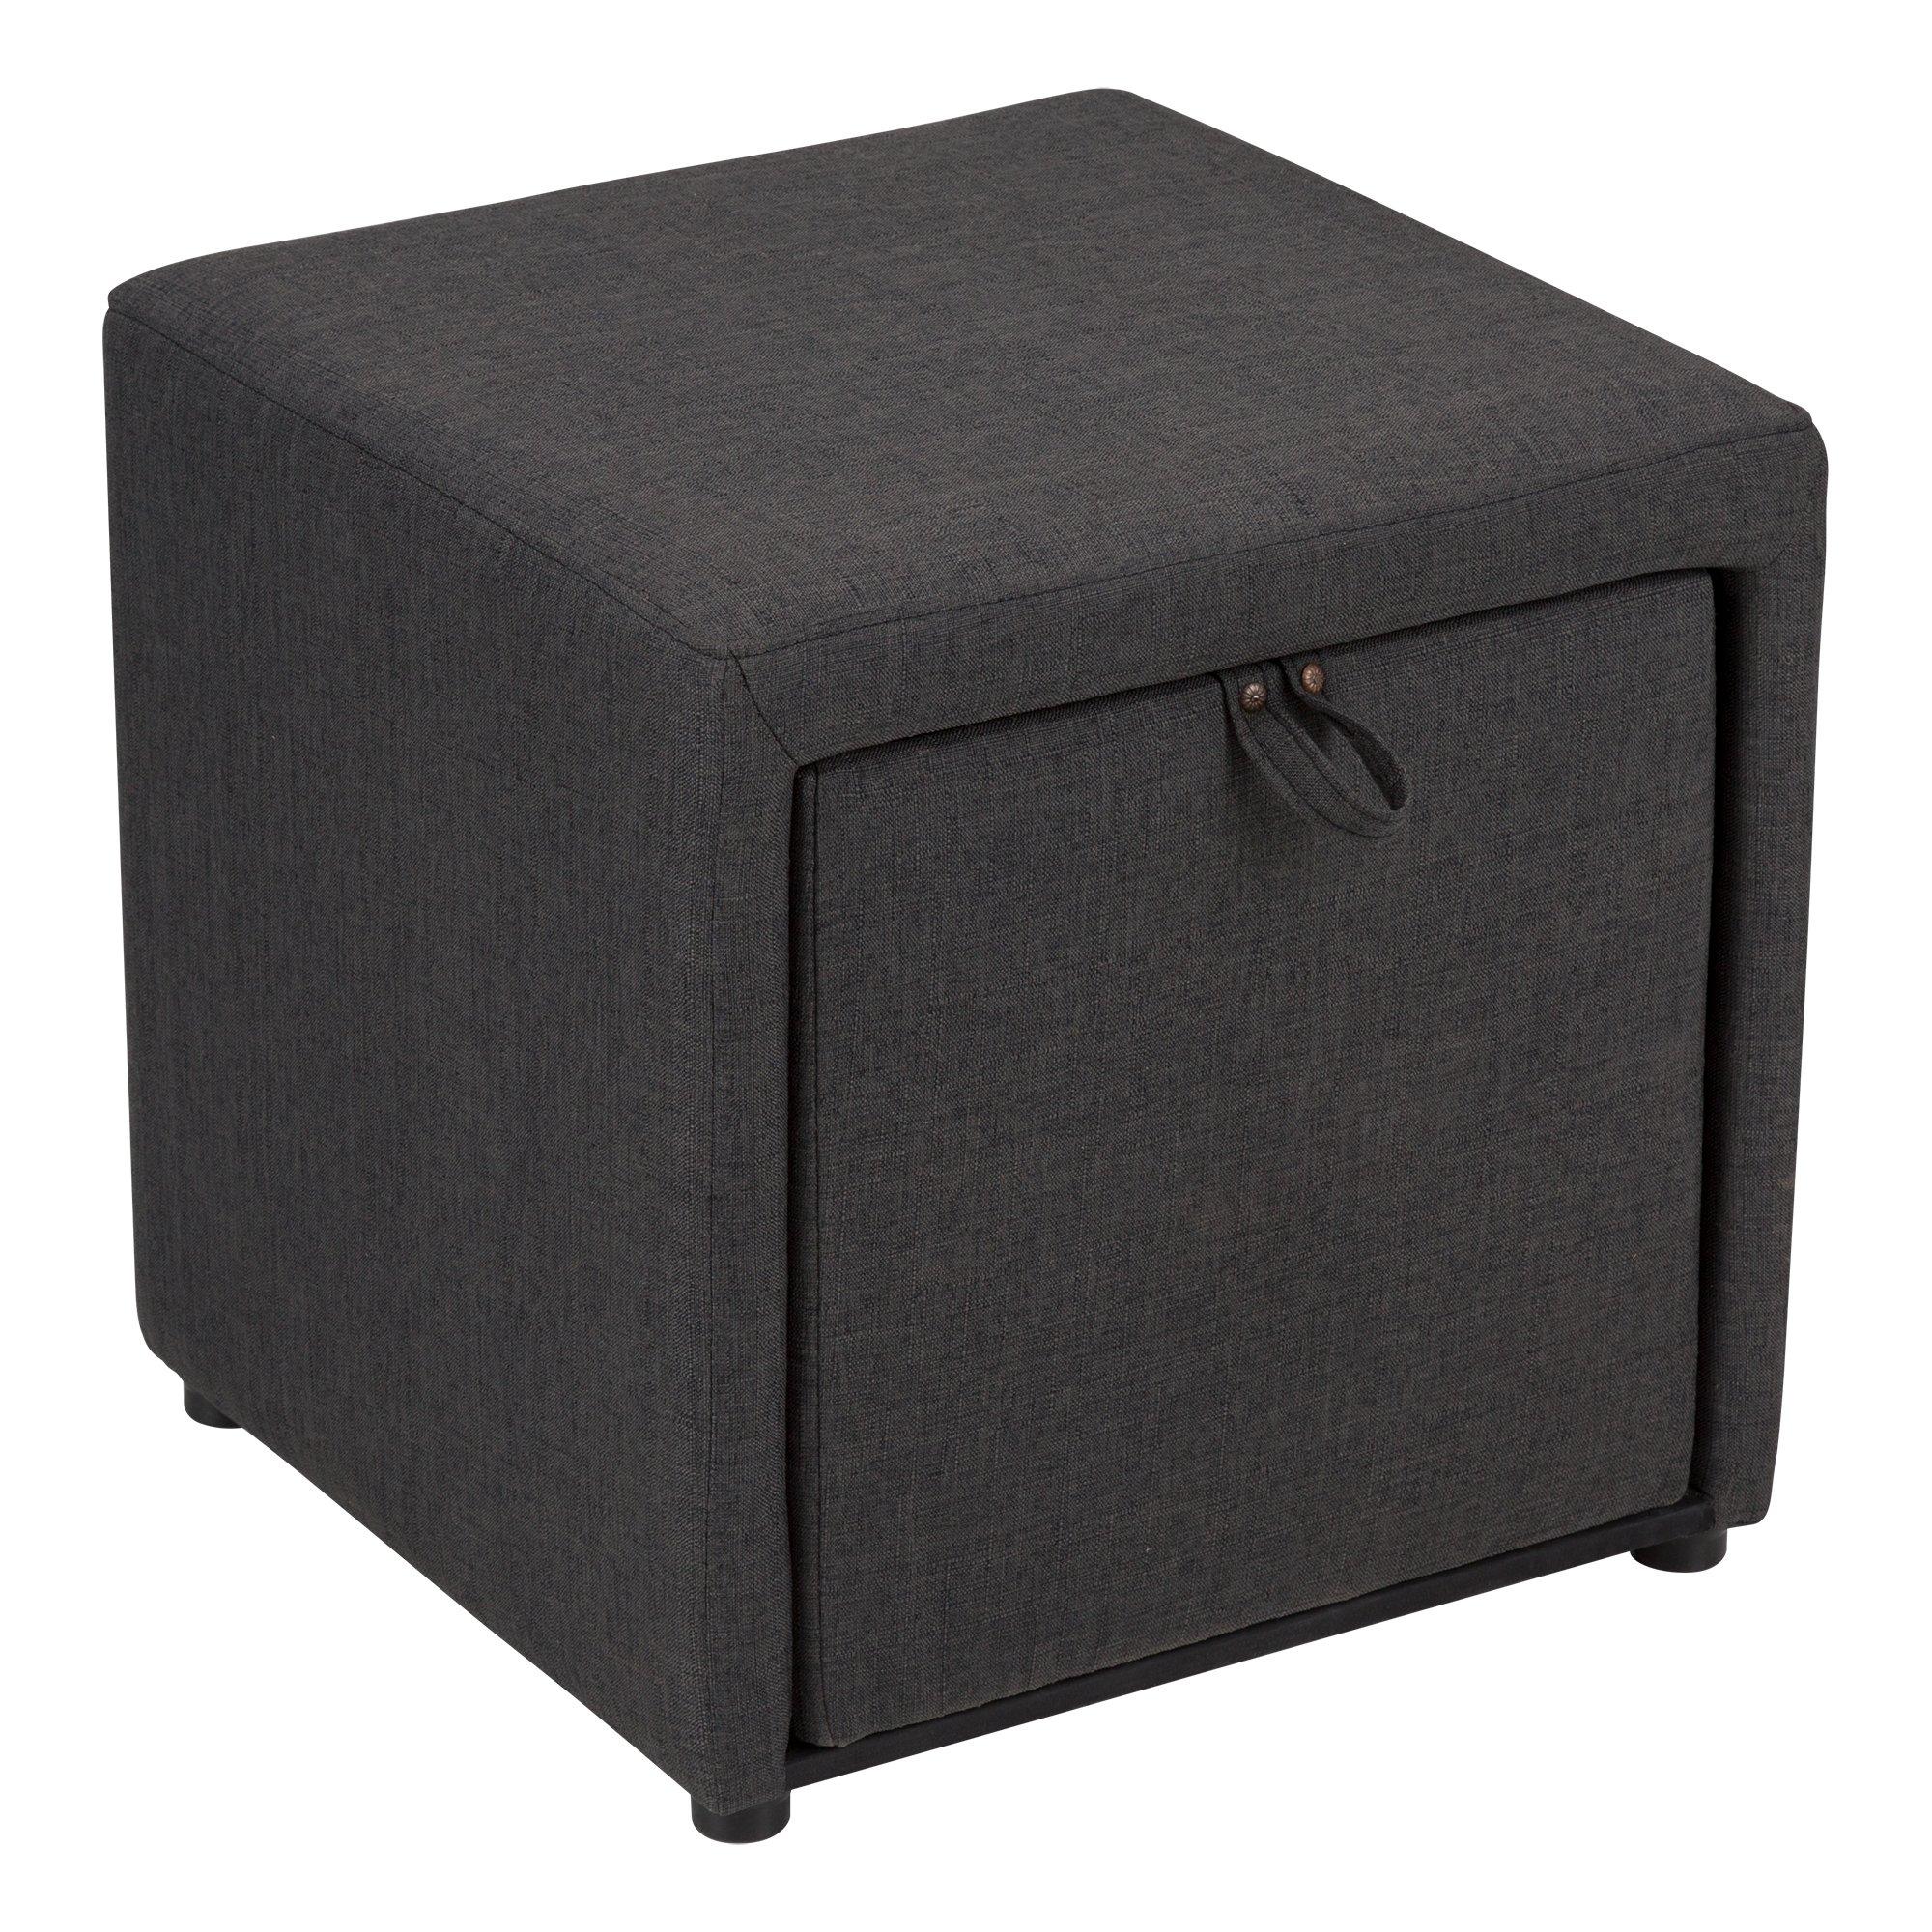 Fat Catalog Cube Storage Stool w/Drawer, Gray, ALT-OUG1001-SO by Fat Catalog (Image #1)